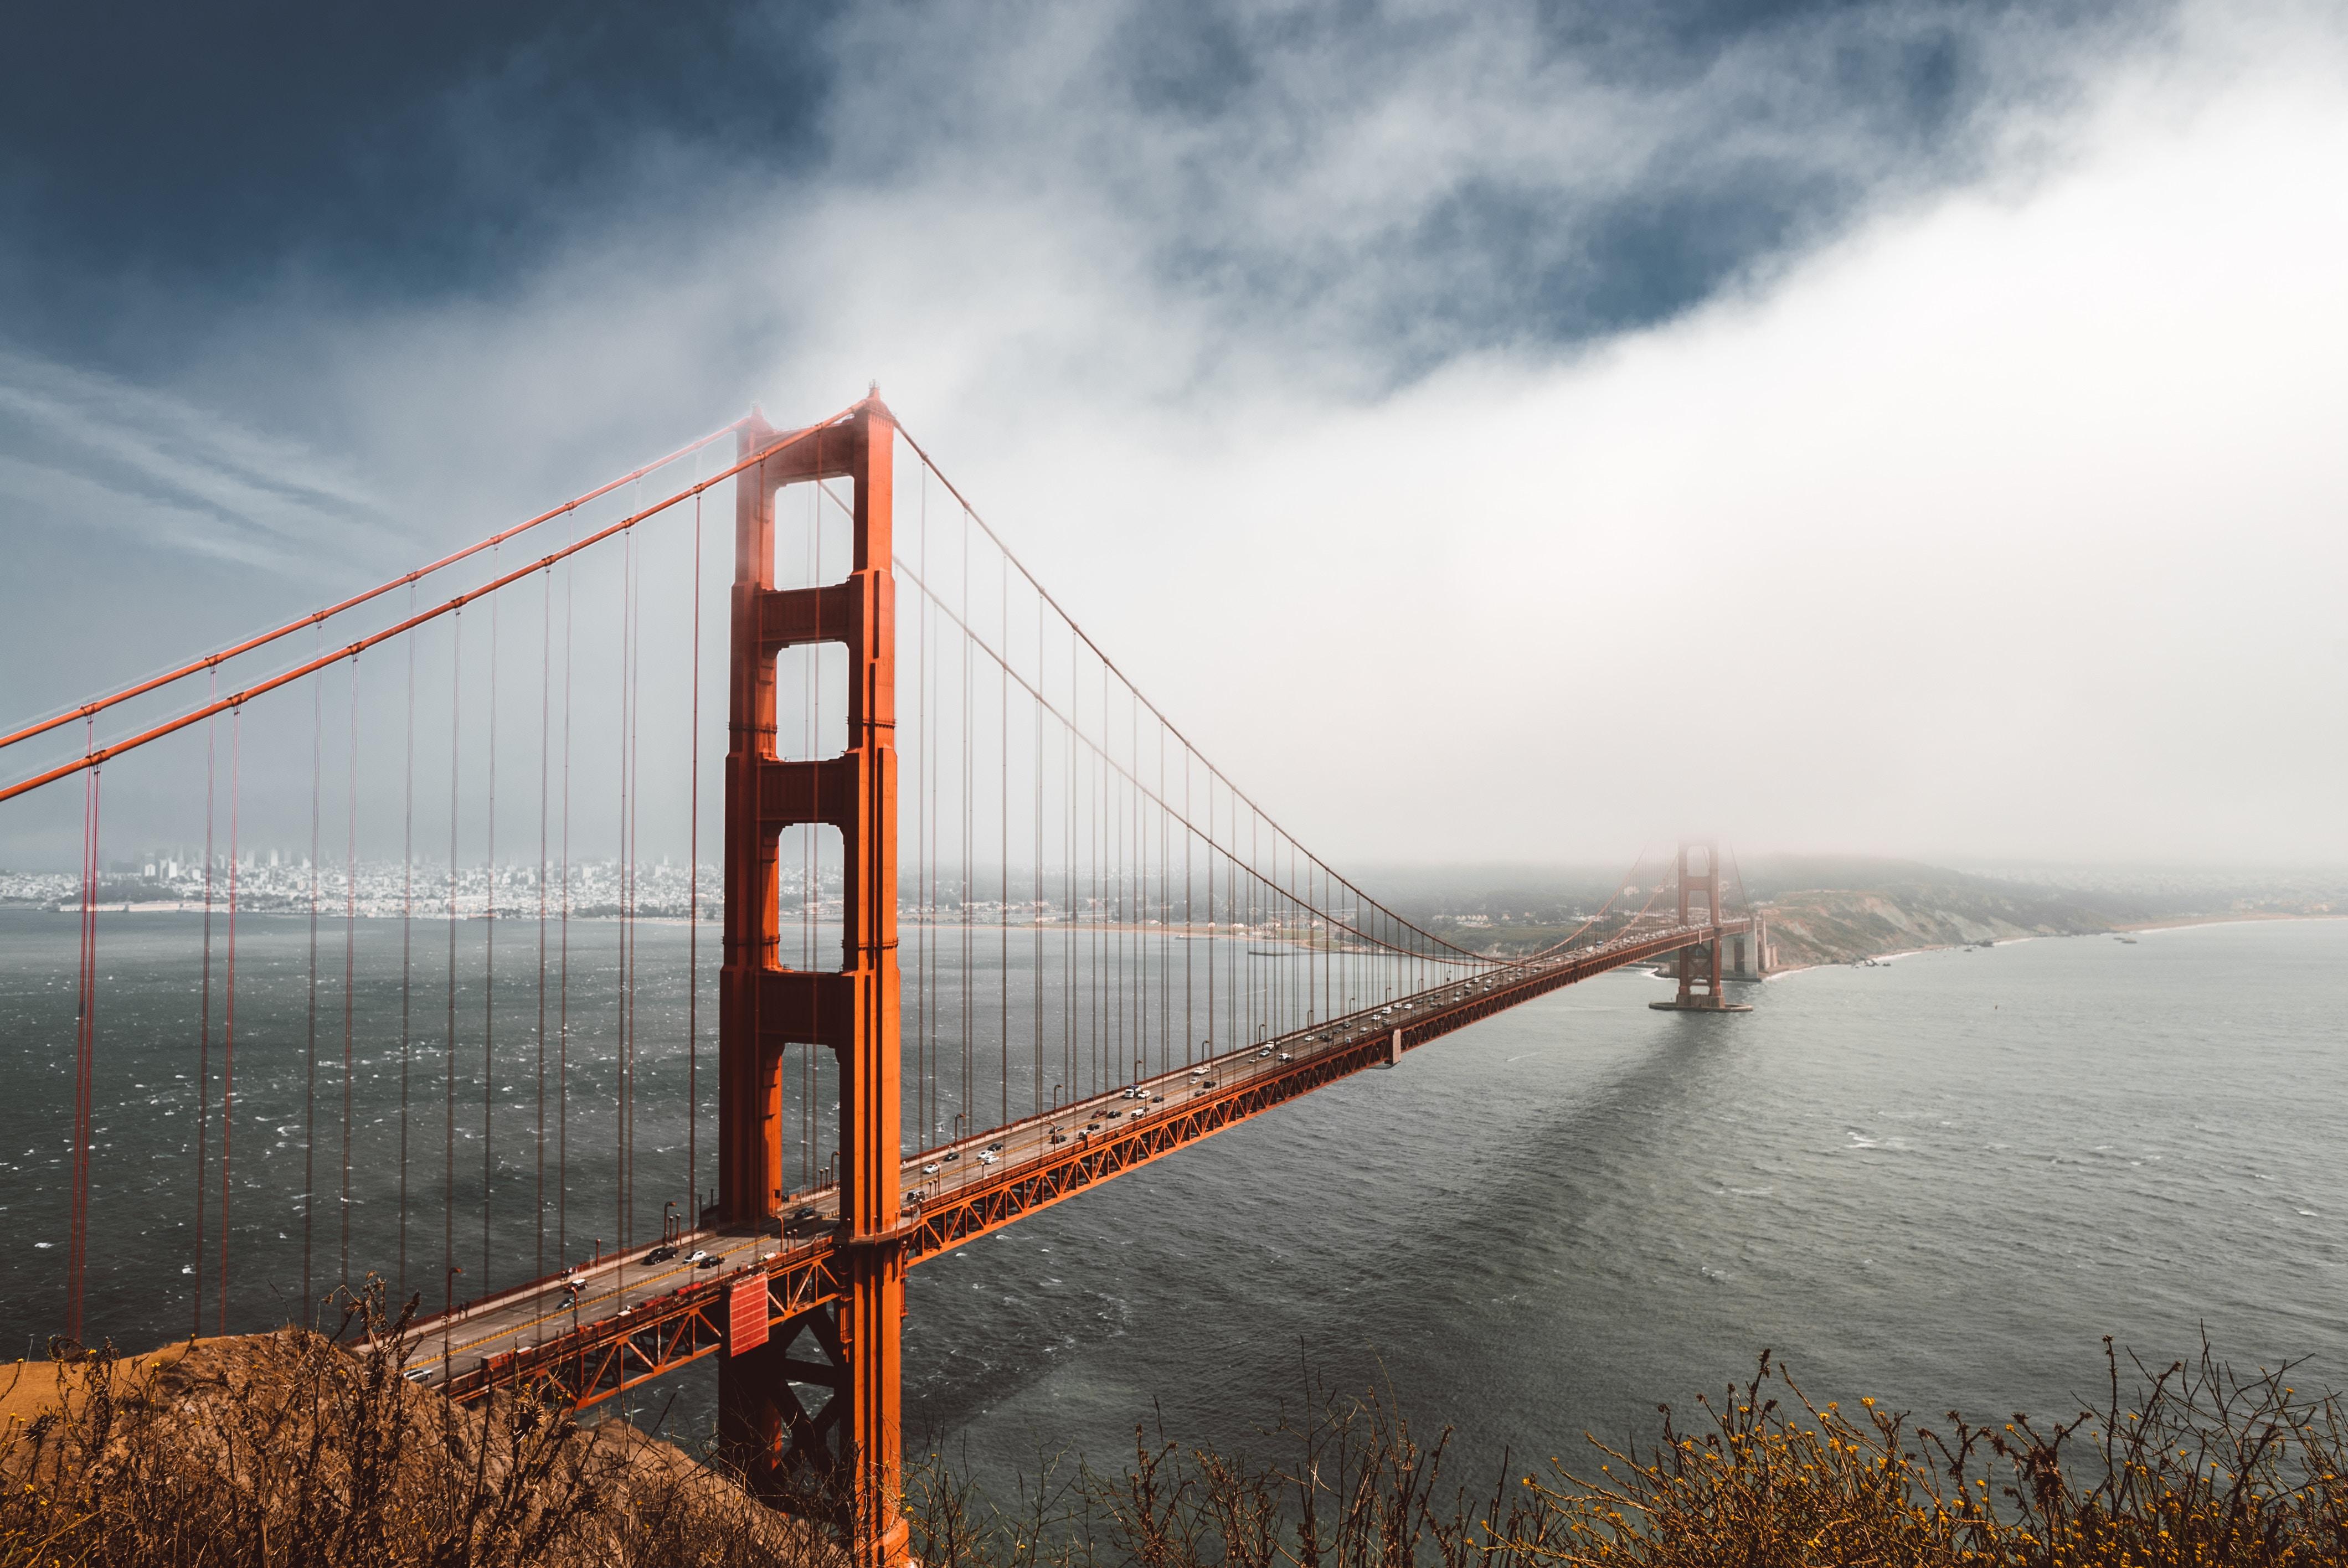 2560x1440 4k golden gate bridge 1440p resolution hd 4k wallpapers images backgrounds photos - Cisco wallpaper 4k ...